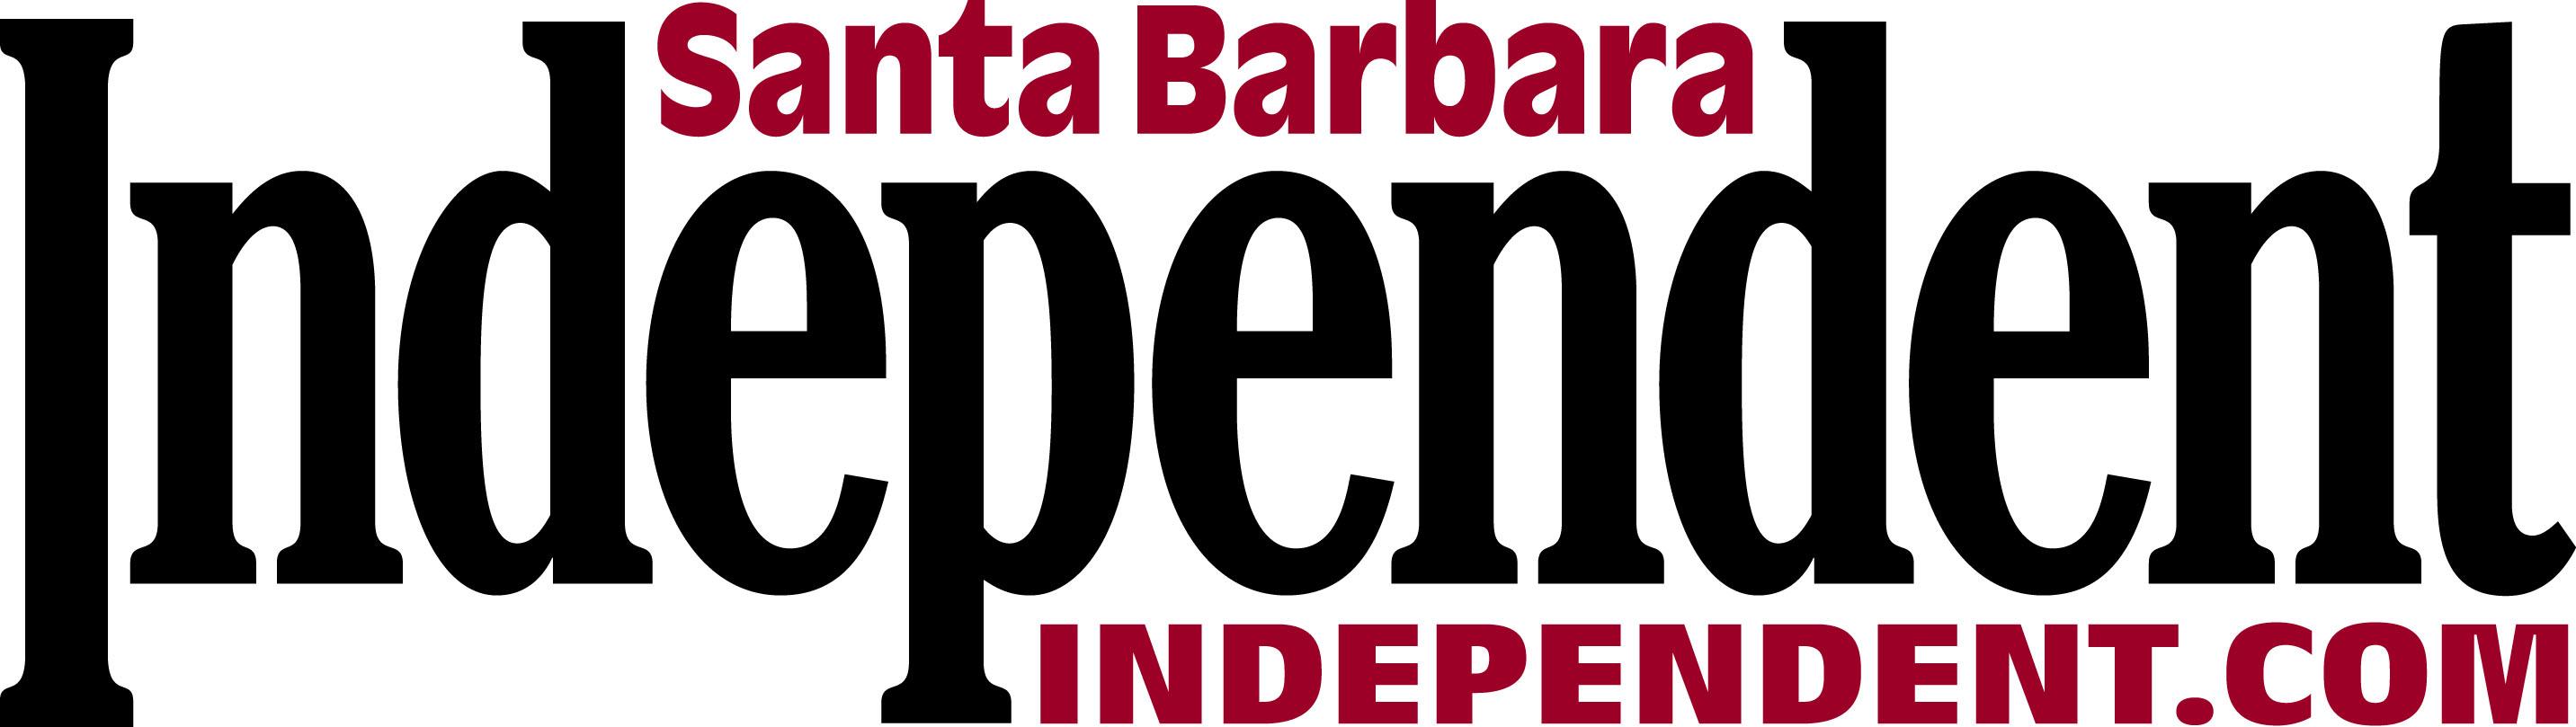 SBIndependent_Logo.jpg